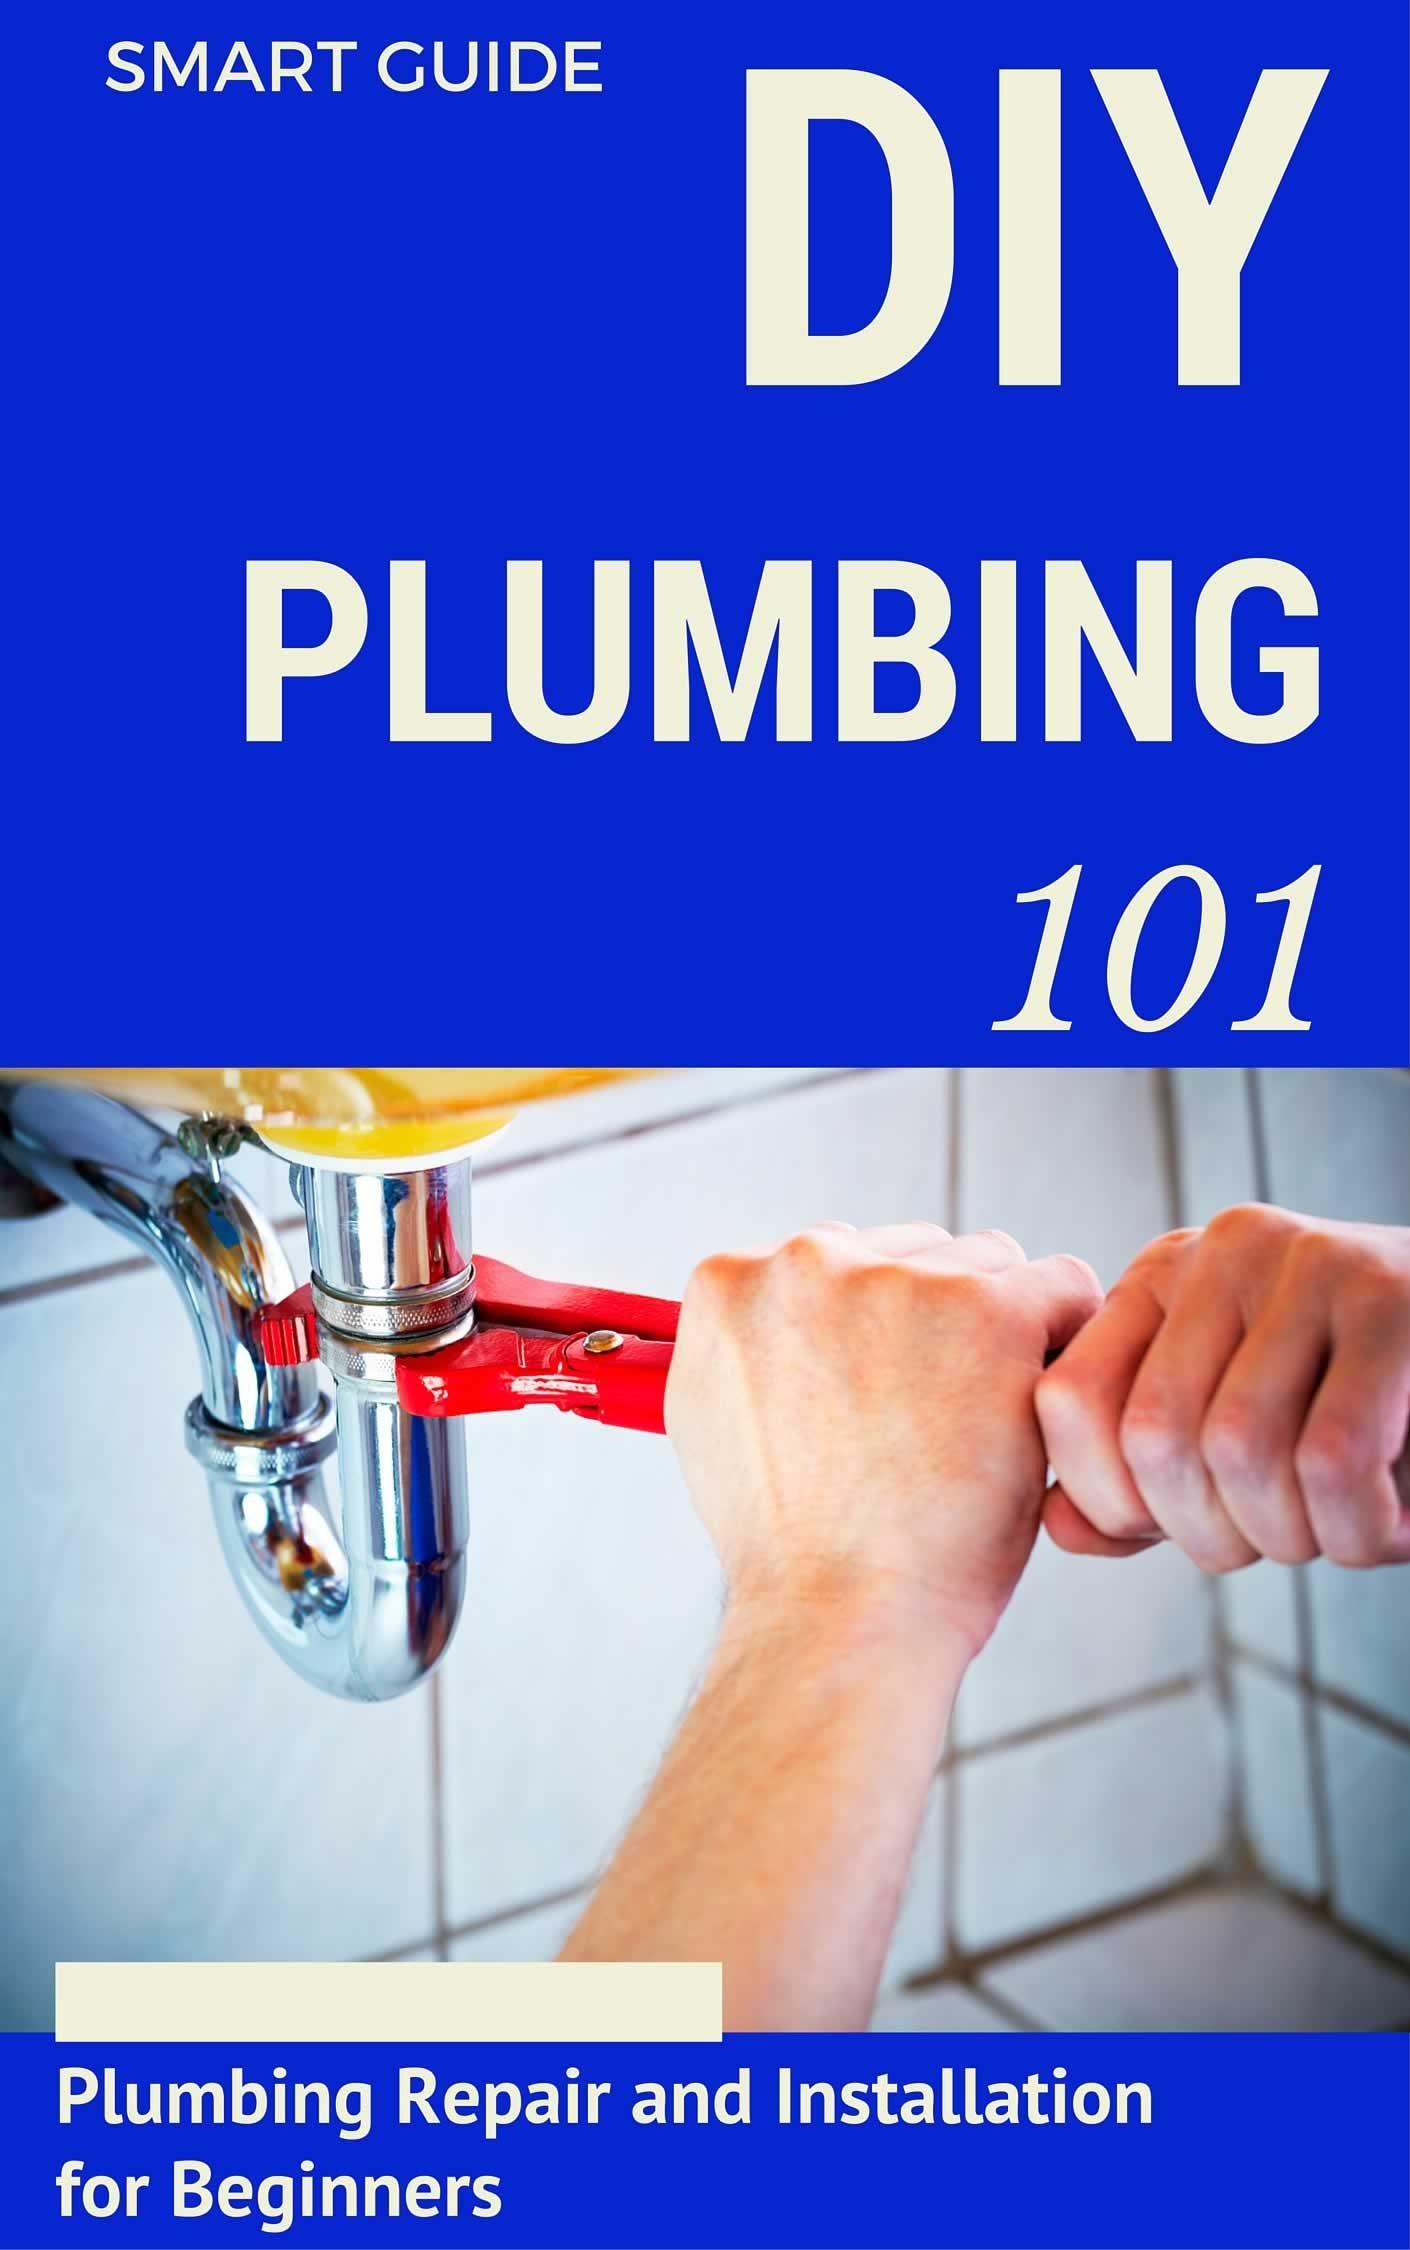 Plumbing  DIY For Beginners   Plumbing Repair And Installation For Beginners   Plumbing For Dummies  DIY Projects   DIY Household Hacks   Plumbing Tips   Plumbing Parts Book 1   English Edition